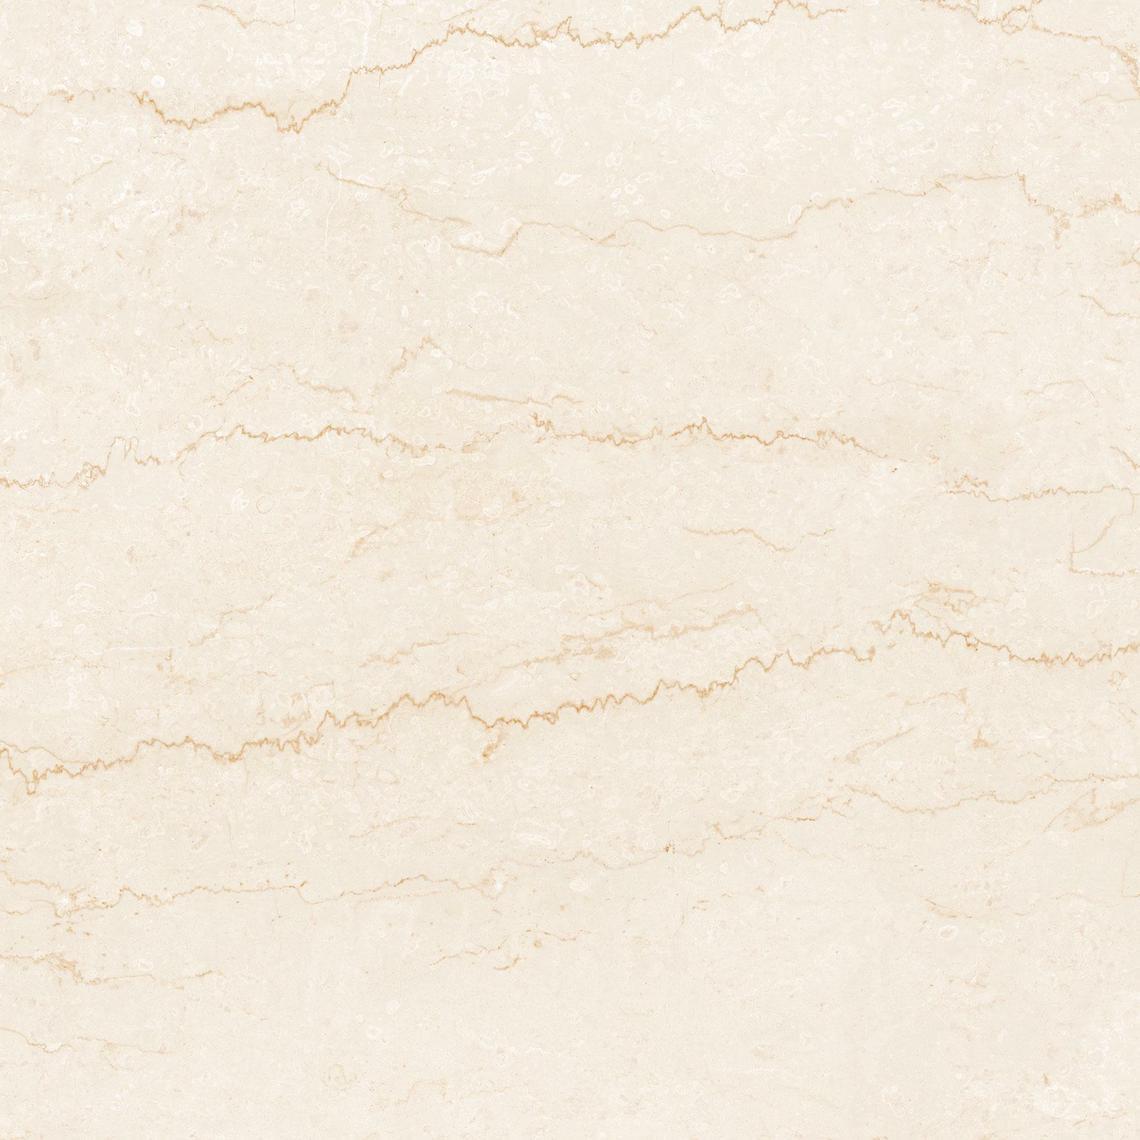 BOTTICINO RECT. AG (60x60)